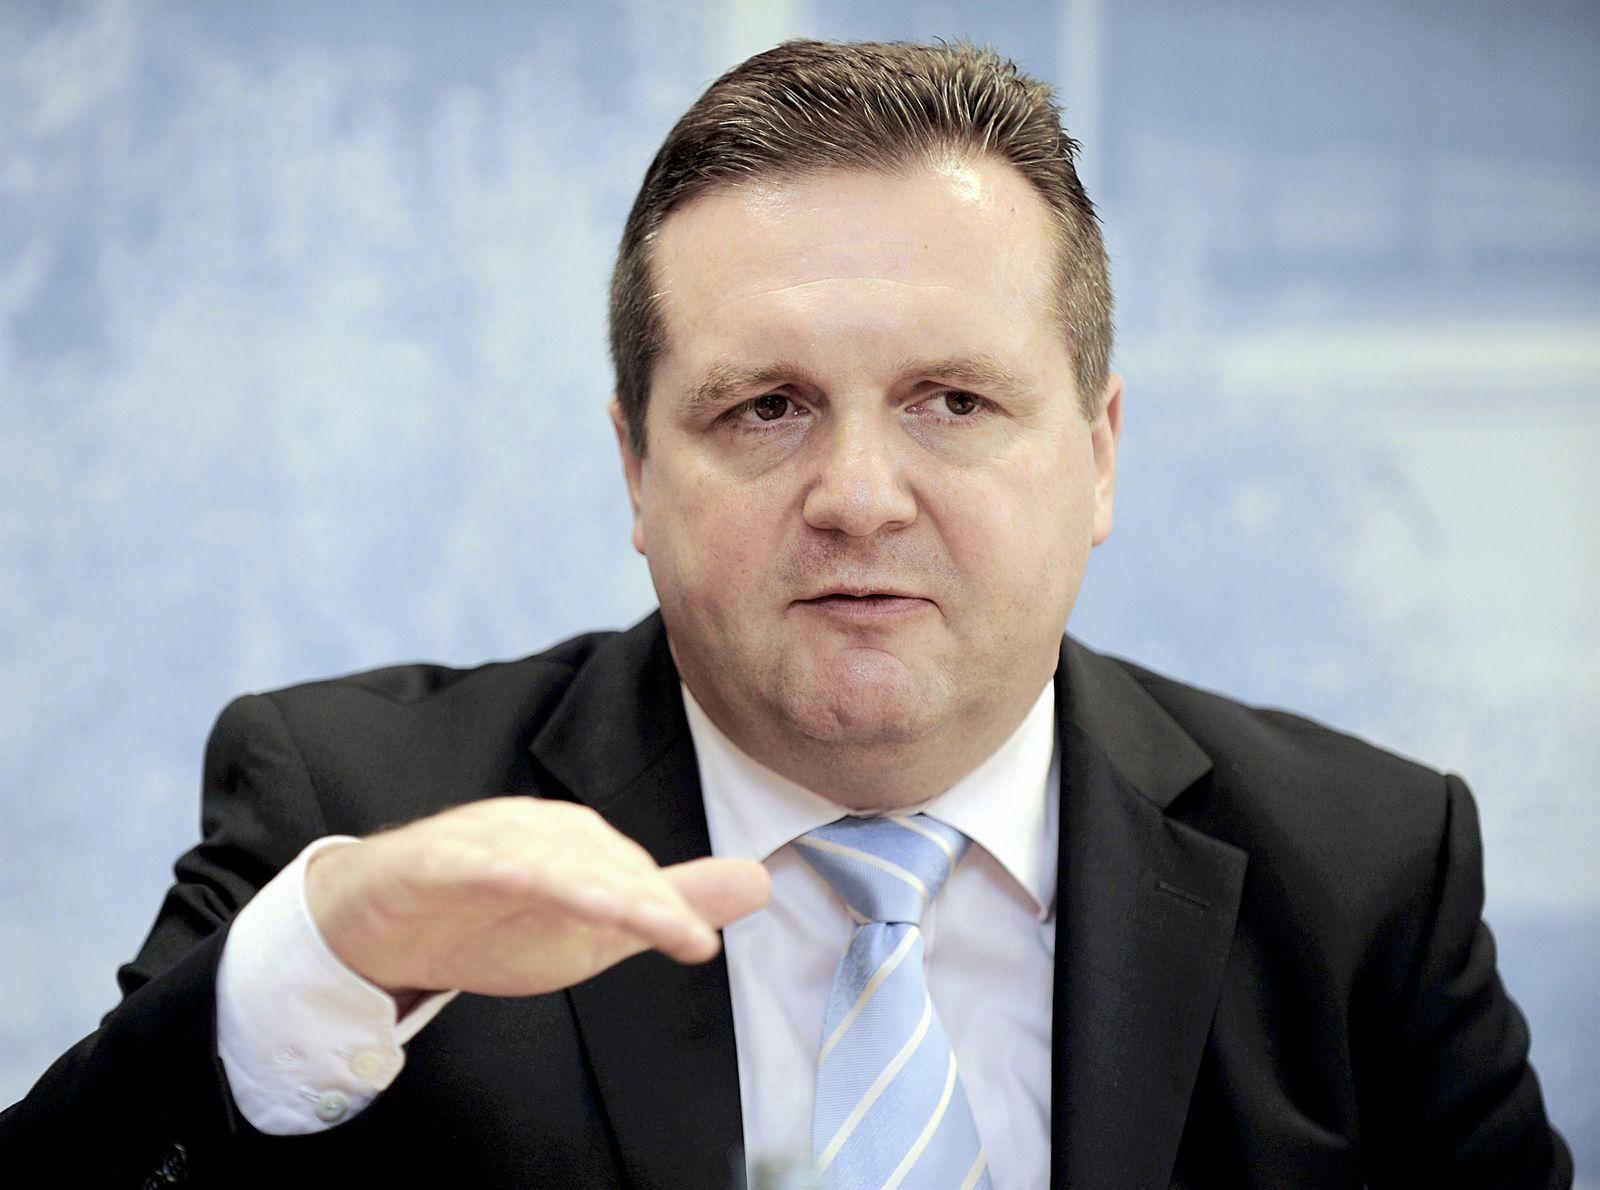 Ministerpräsident Stefan Mappus